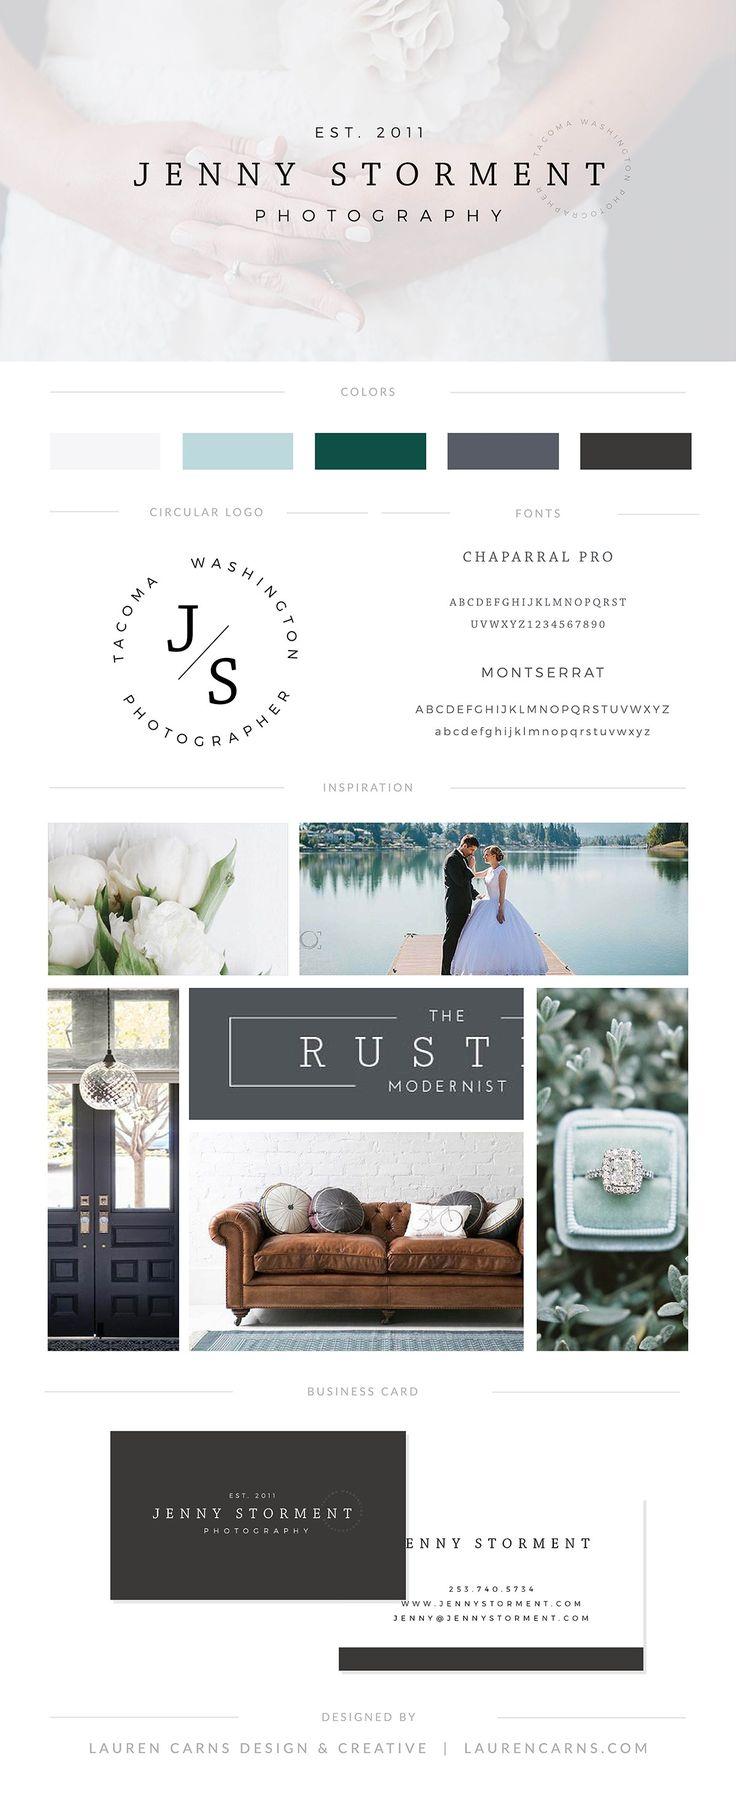 Jenny Storment Brand Board | Lauren Carns Branding & Design | Pacific Northwest wedding photographer brand, modern, rustic, muted, sage, grey, blue, crisp, simple, clean